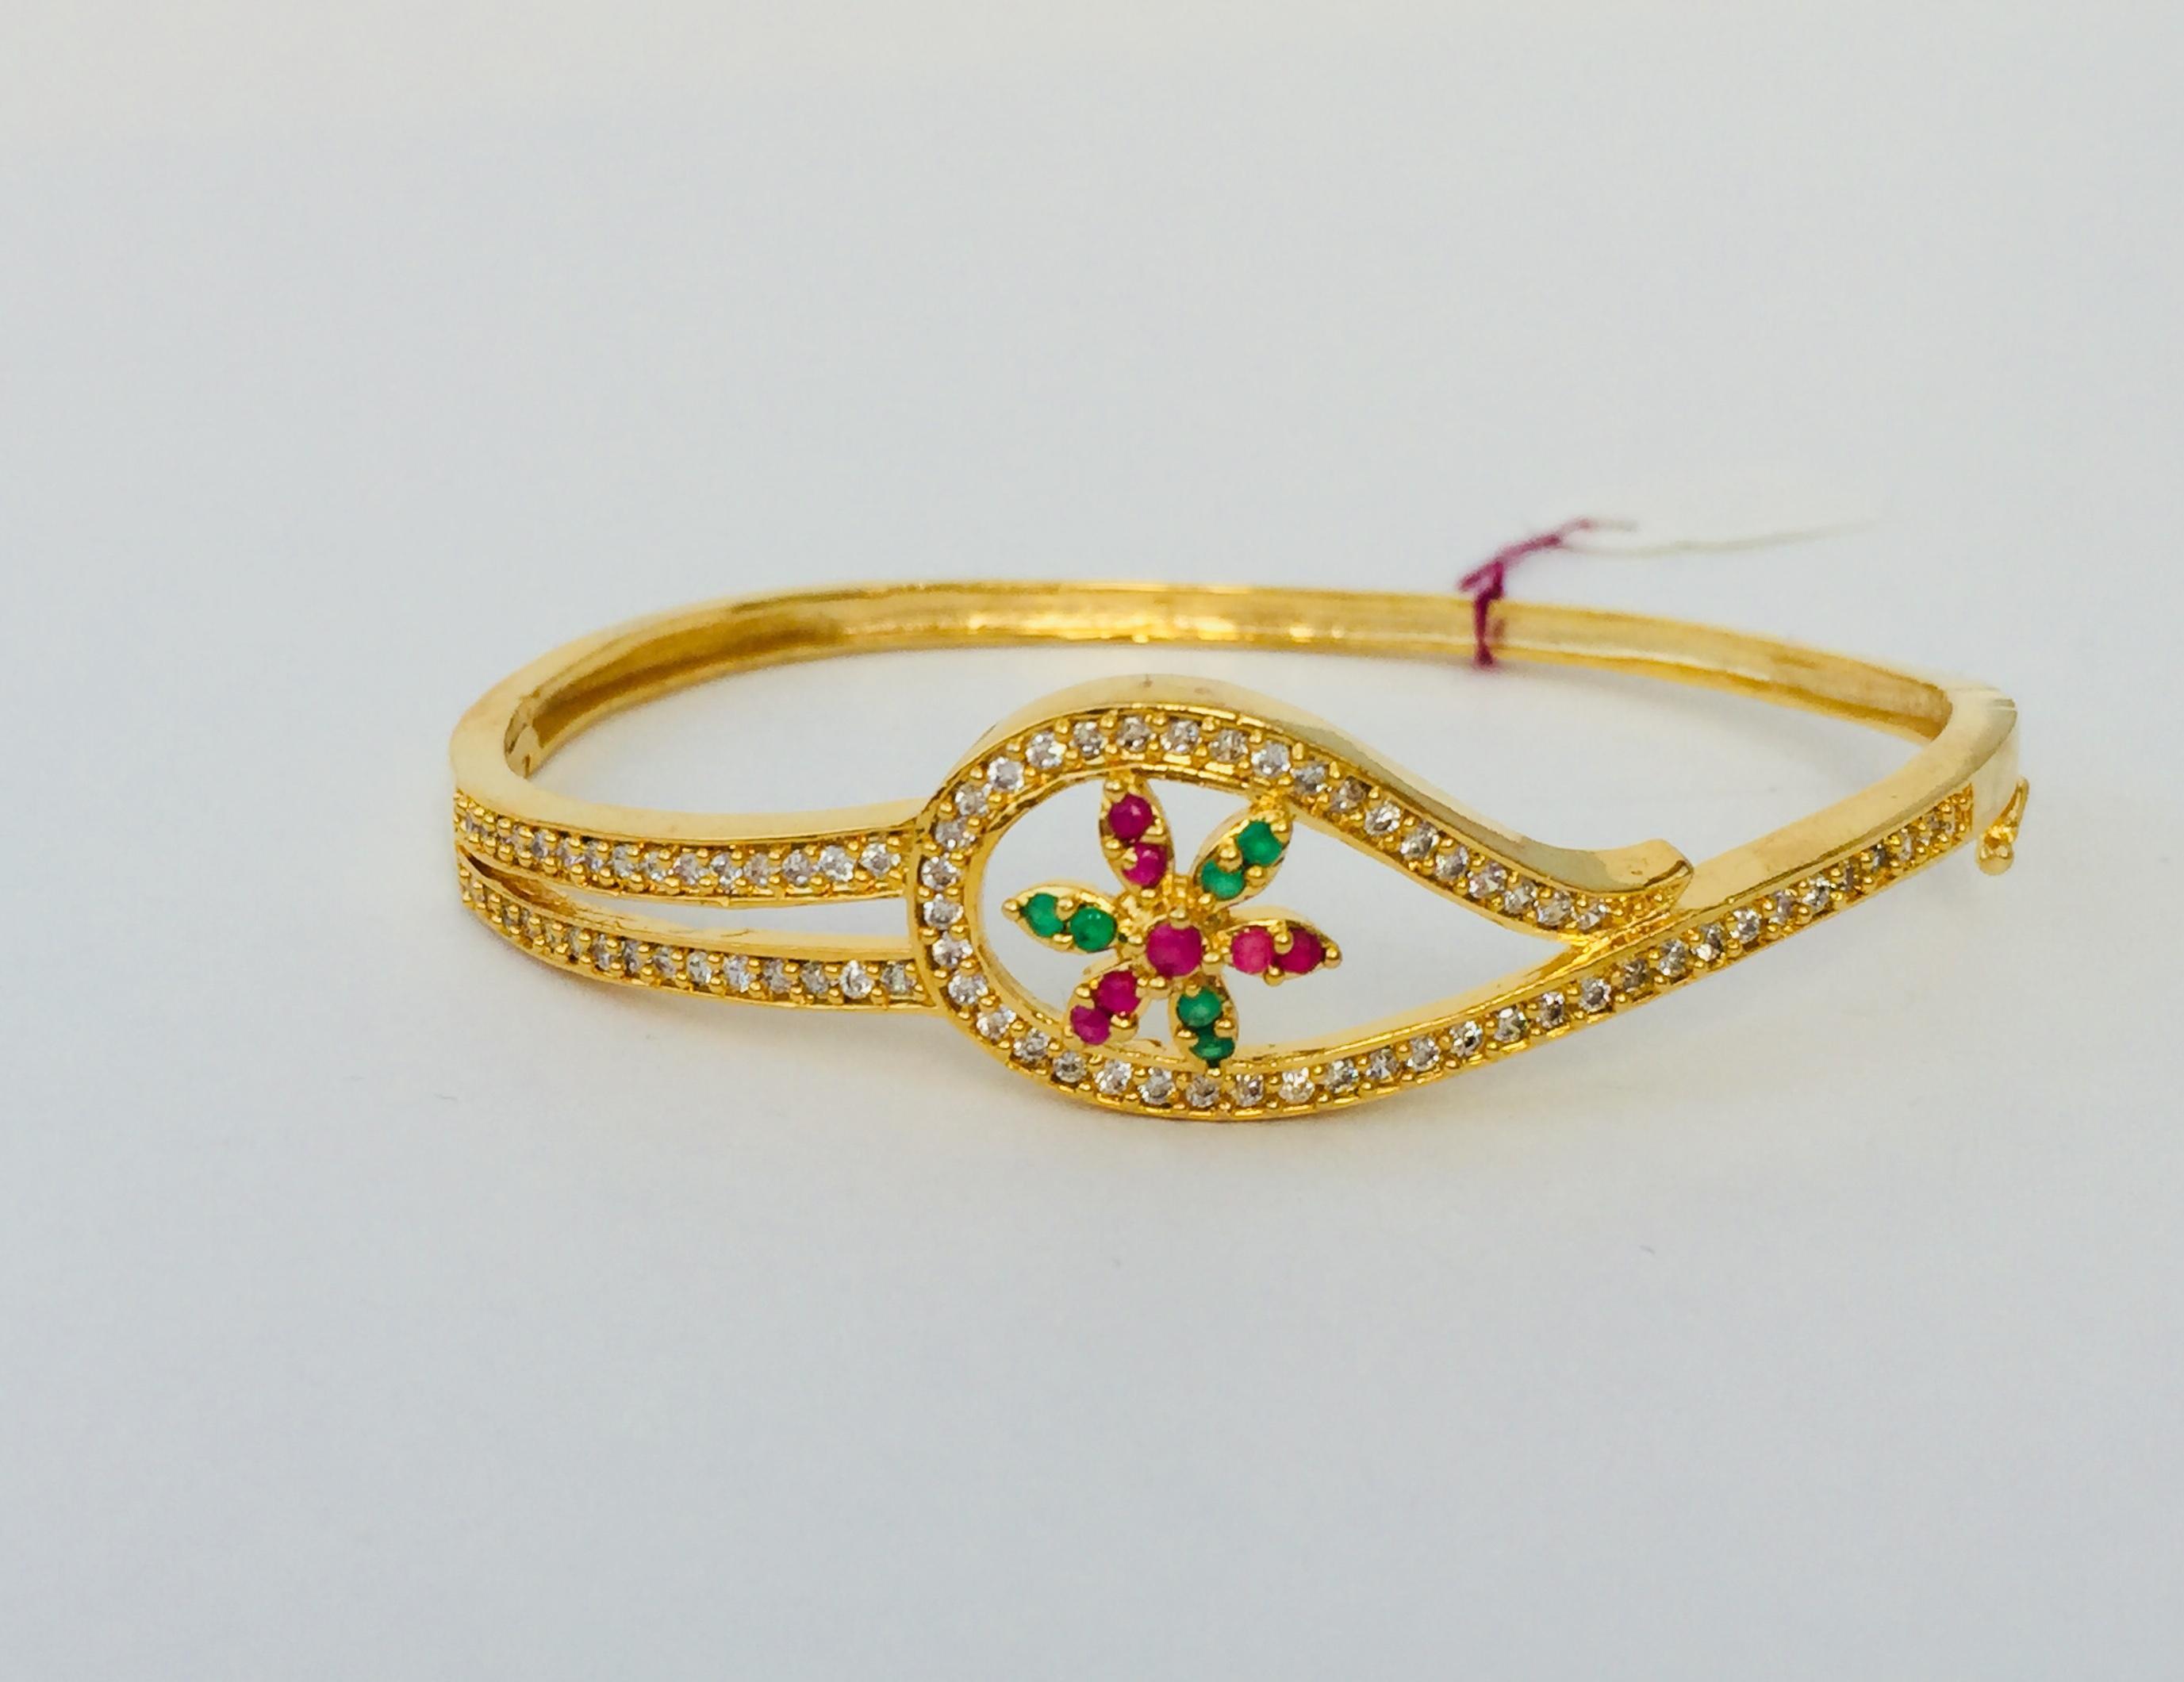 8c694114e42 Floral White Stones Gold Bangle Bracelet | Jewelberry Shack